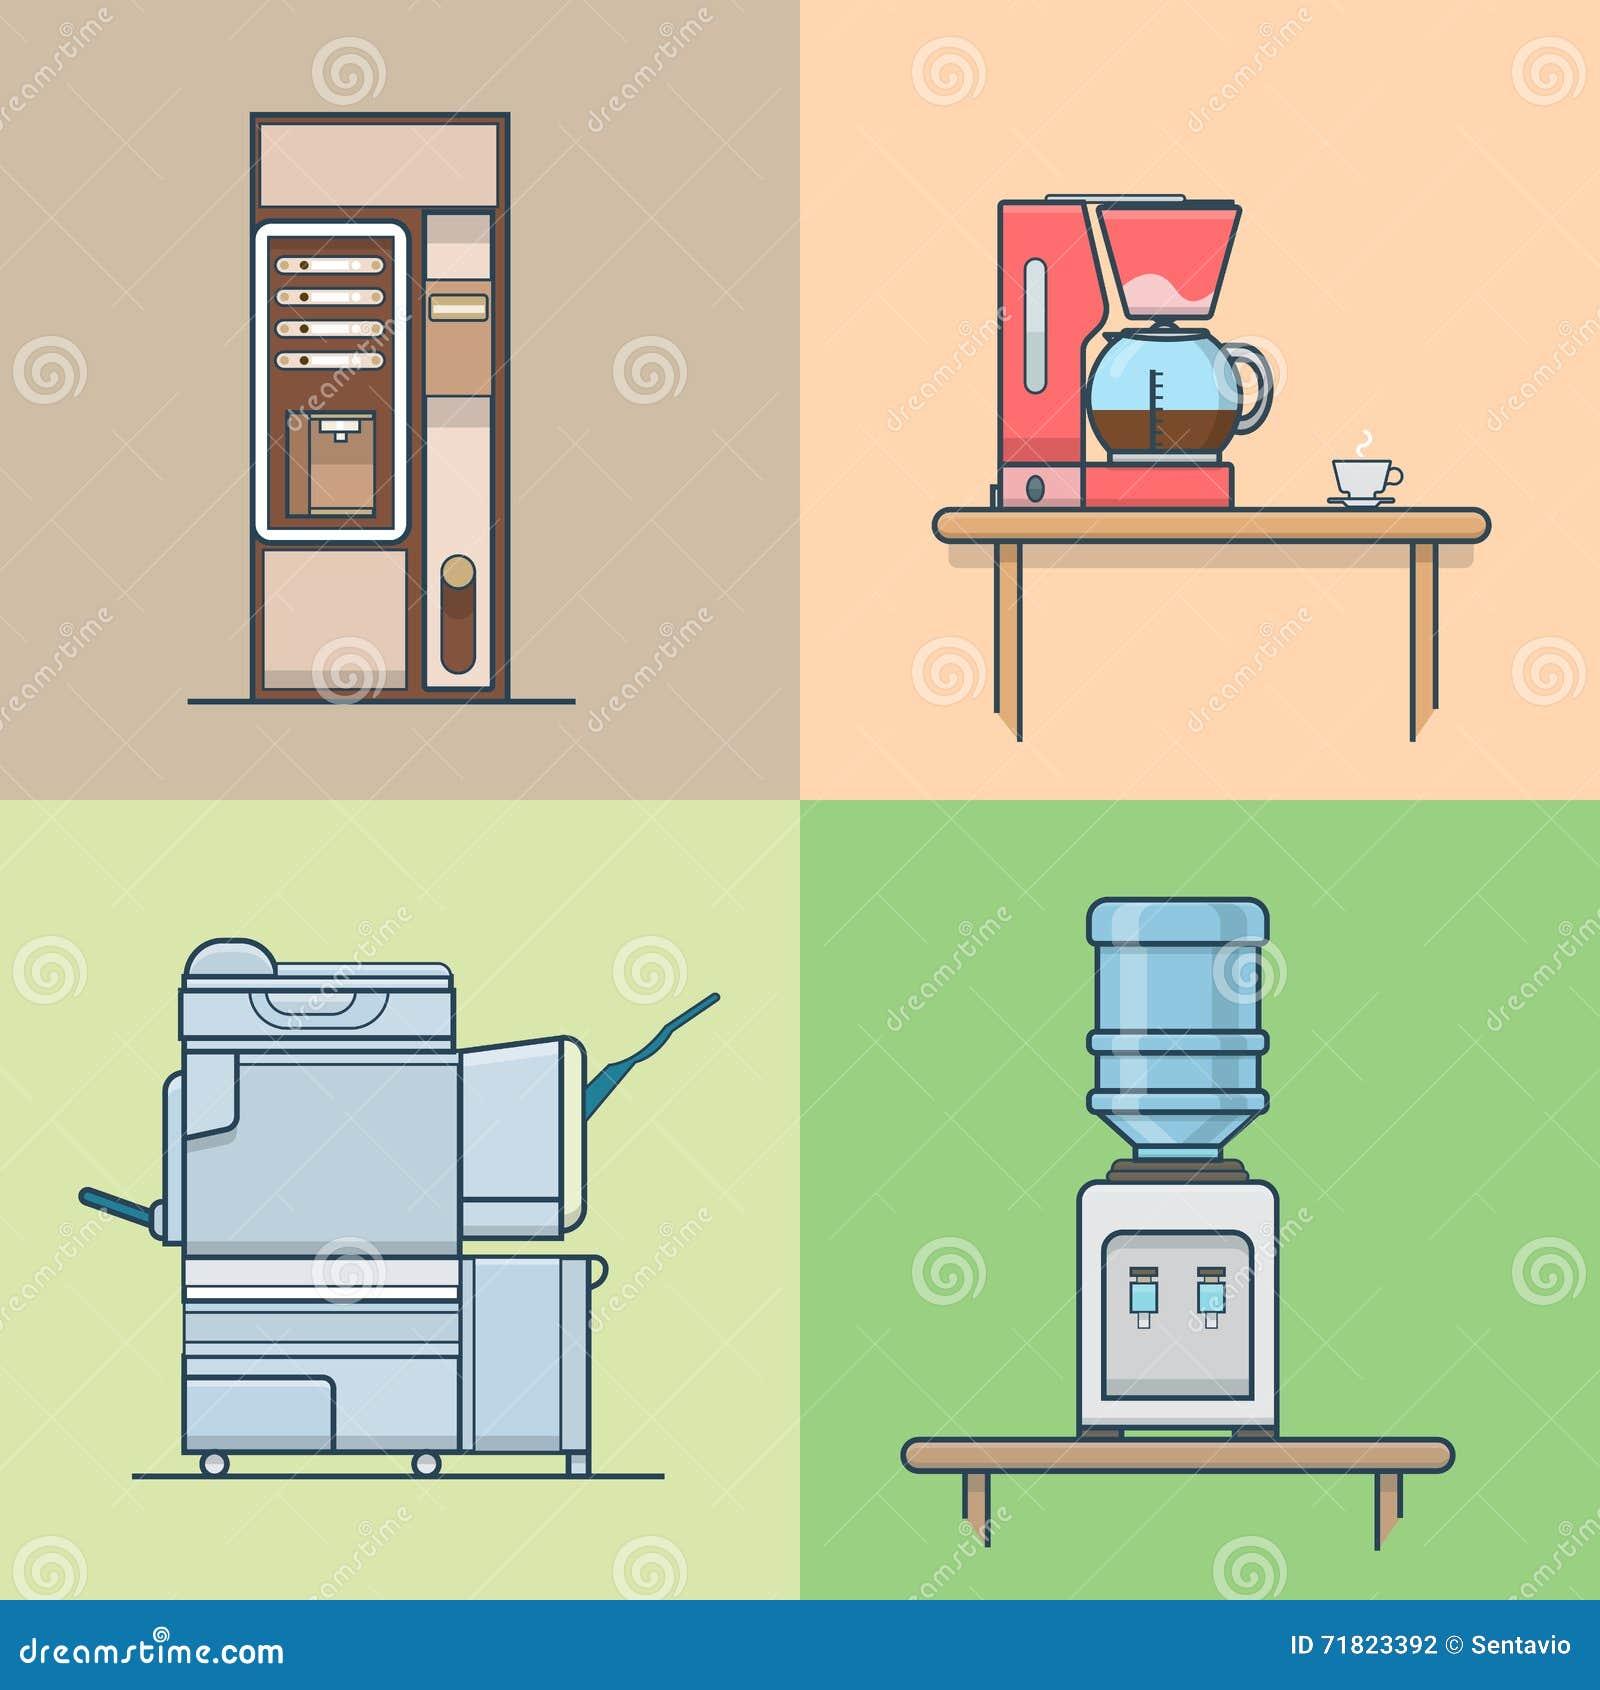 Office Kitchen Interior Design: Office Kitchen Technical Room Interior Indoor Set. Stock